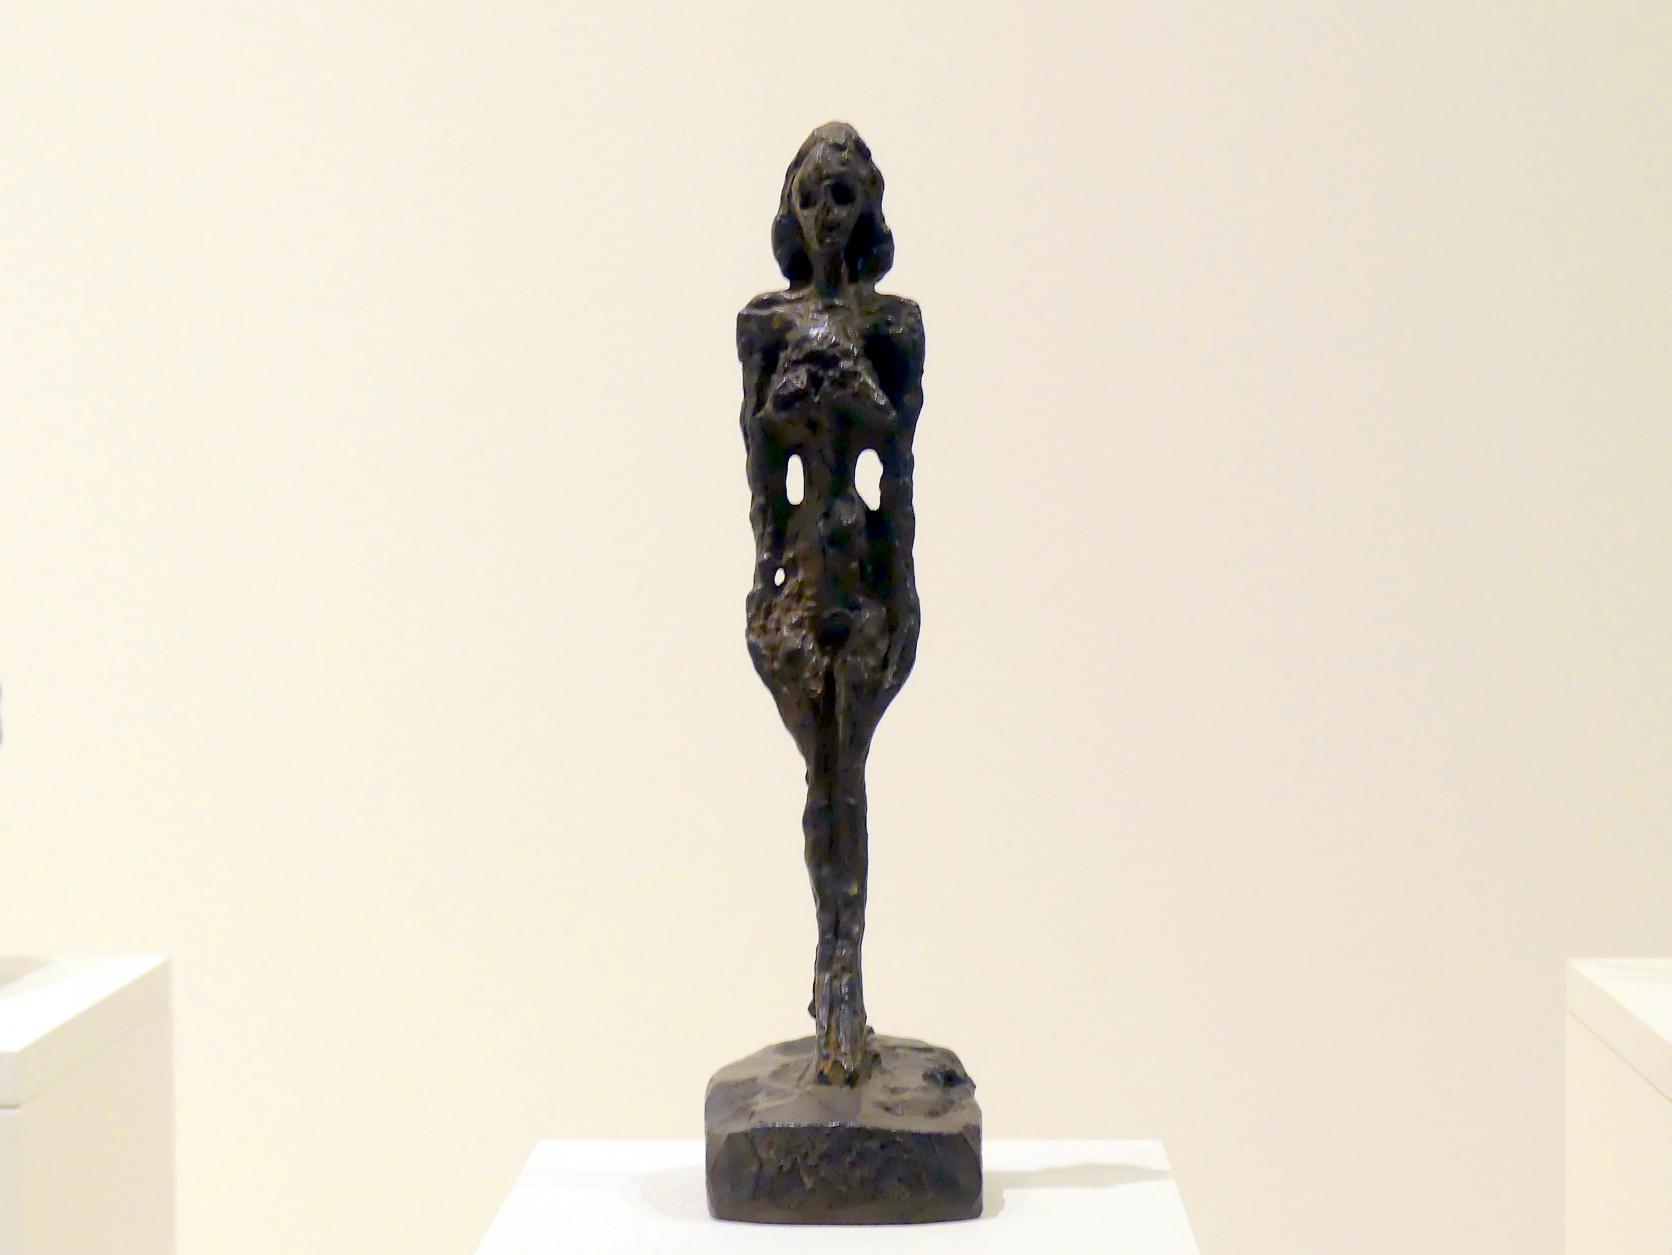 Alberto Giacometti: Stehende Frau, 1953 - 1954